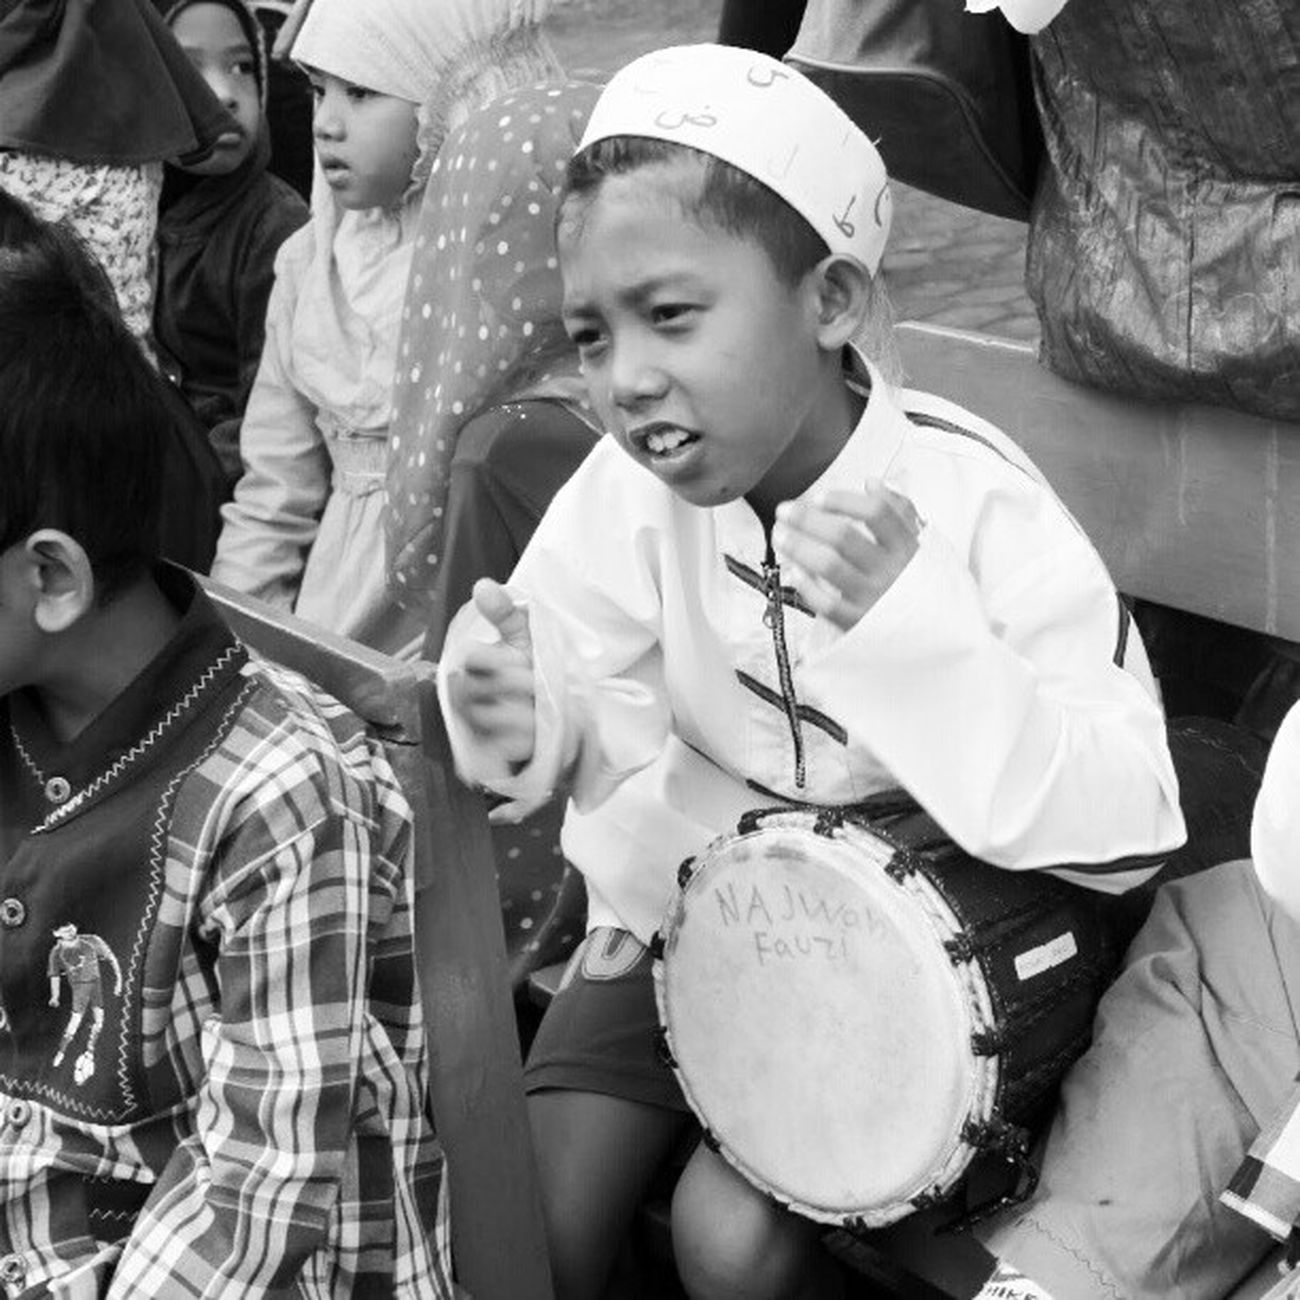 Playing Music , Instagramers Instanusantara Instanusantarapalingindonesia instanusantaraBW instasunda instadroid andronesia andromax blackandwhite hitamputih kids Indonesia Bandung elementary school boy Cijerah tradisi maulid nabi